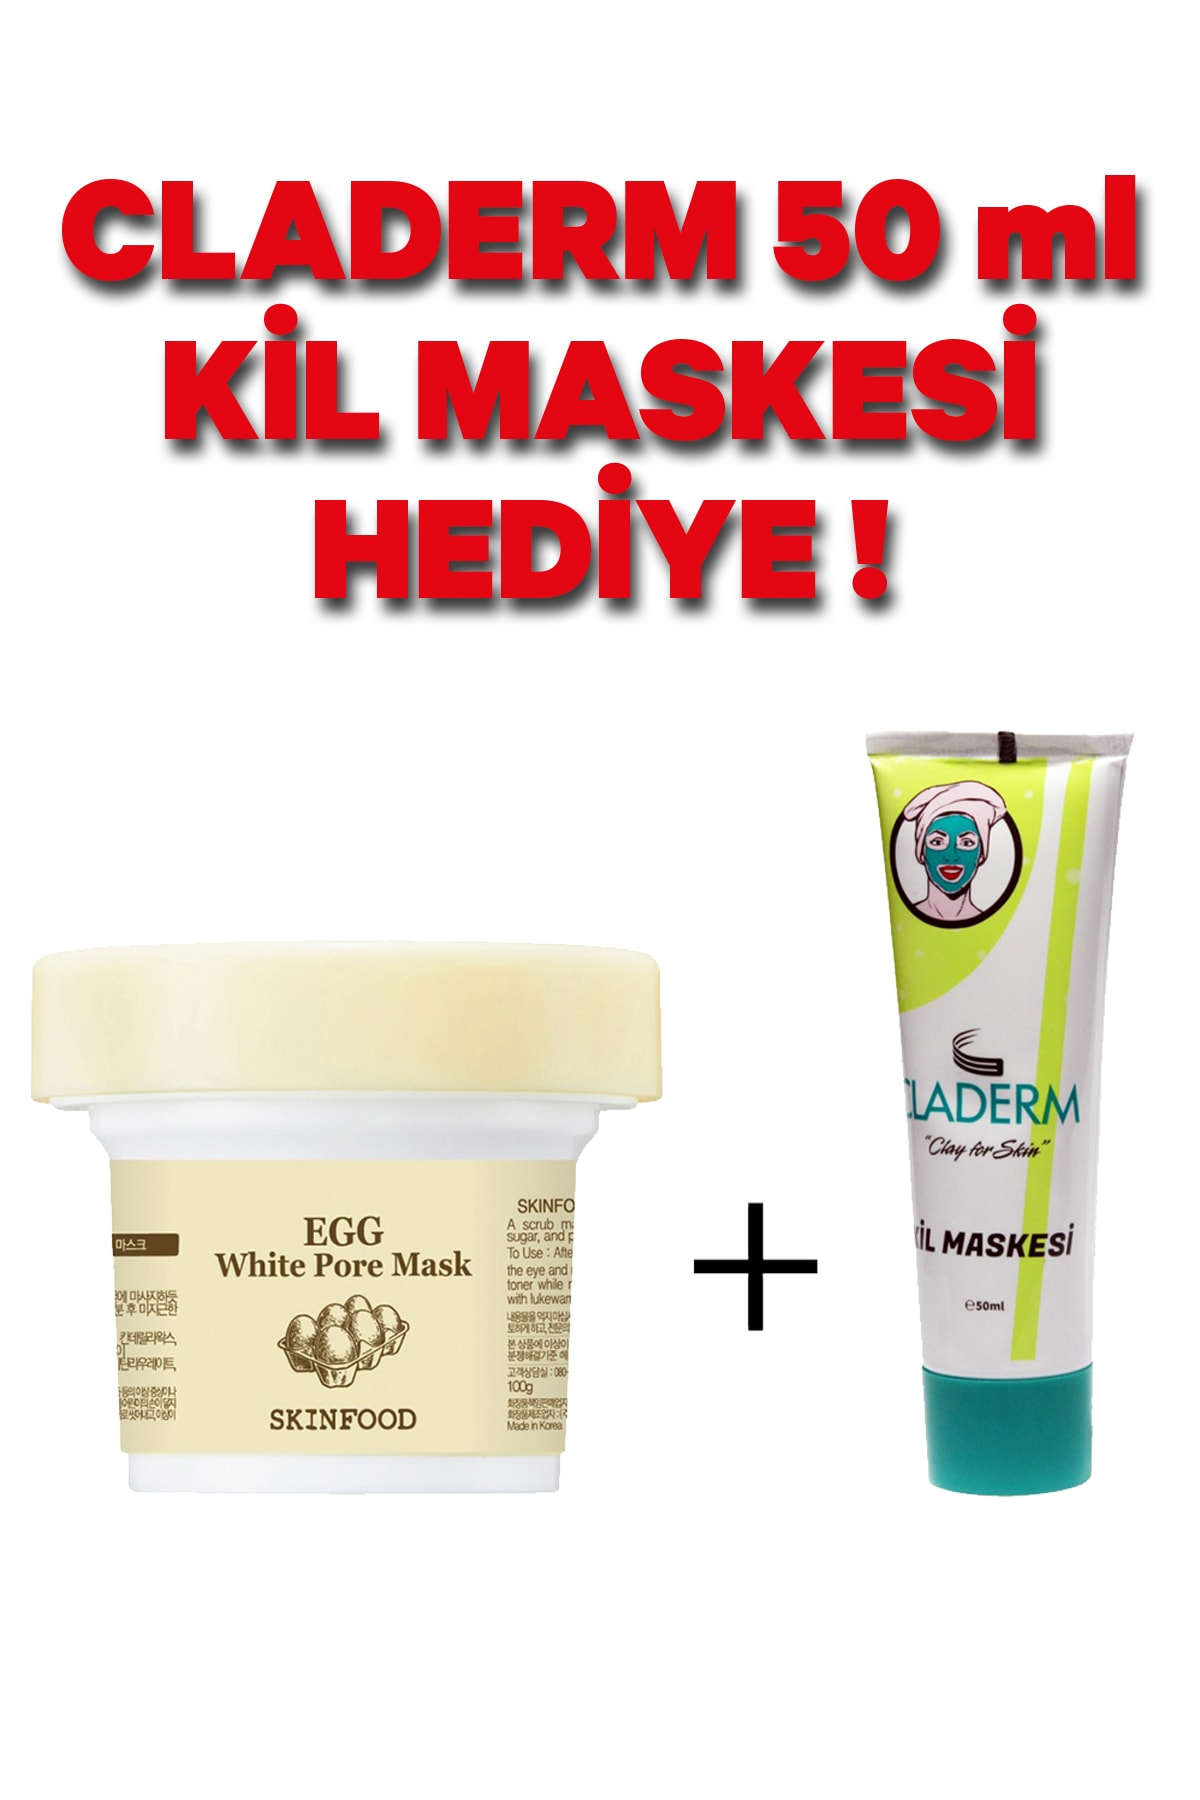 Skinfood Egg White Pore Mask 1